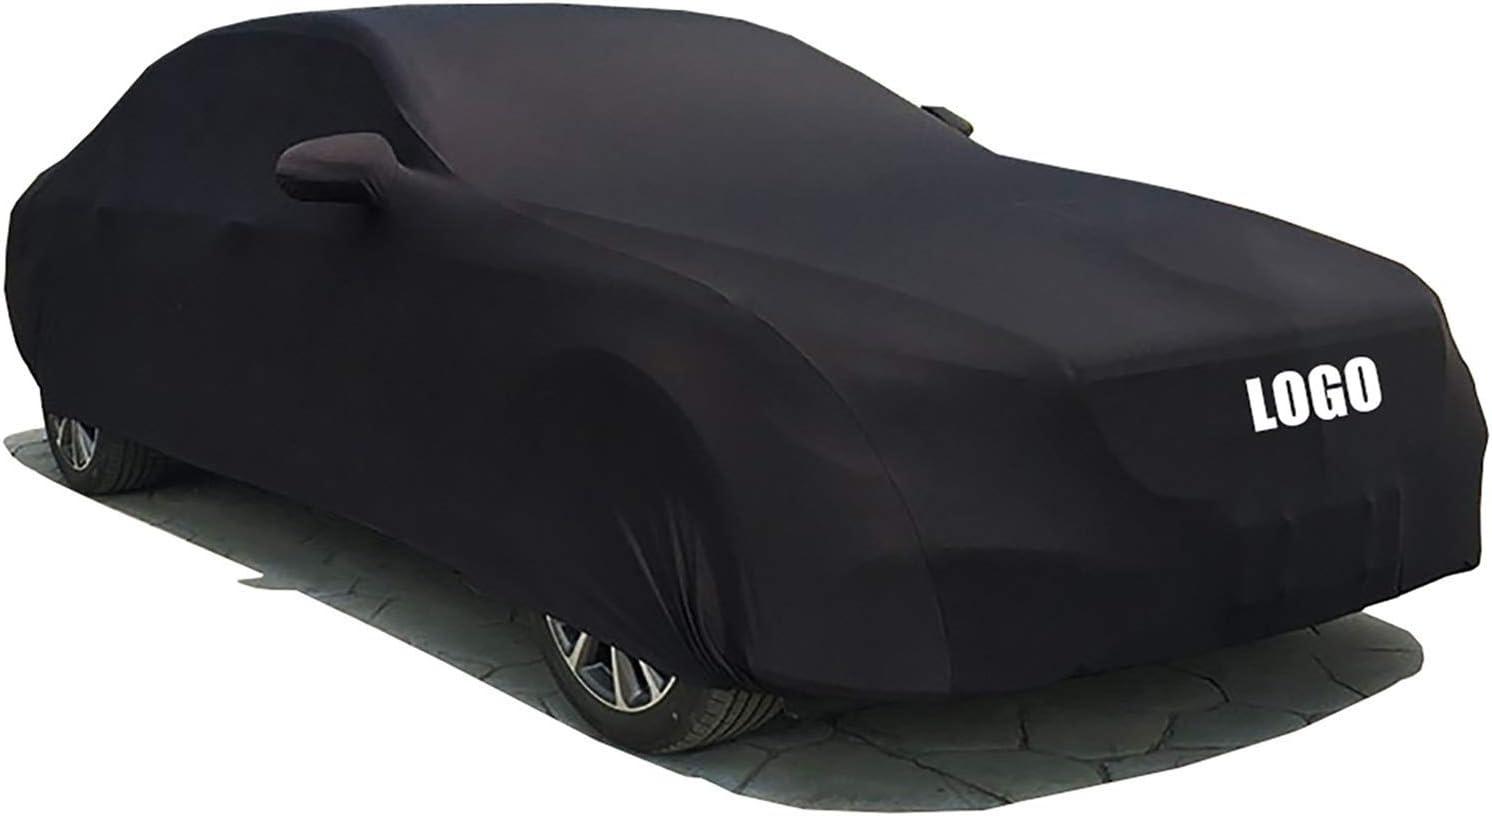 Full Super sale period limited Ultra-Cheap Deals car Cover Sedan - Fo Subaru with Compatible